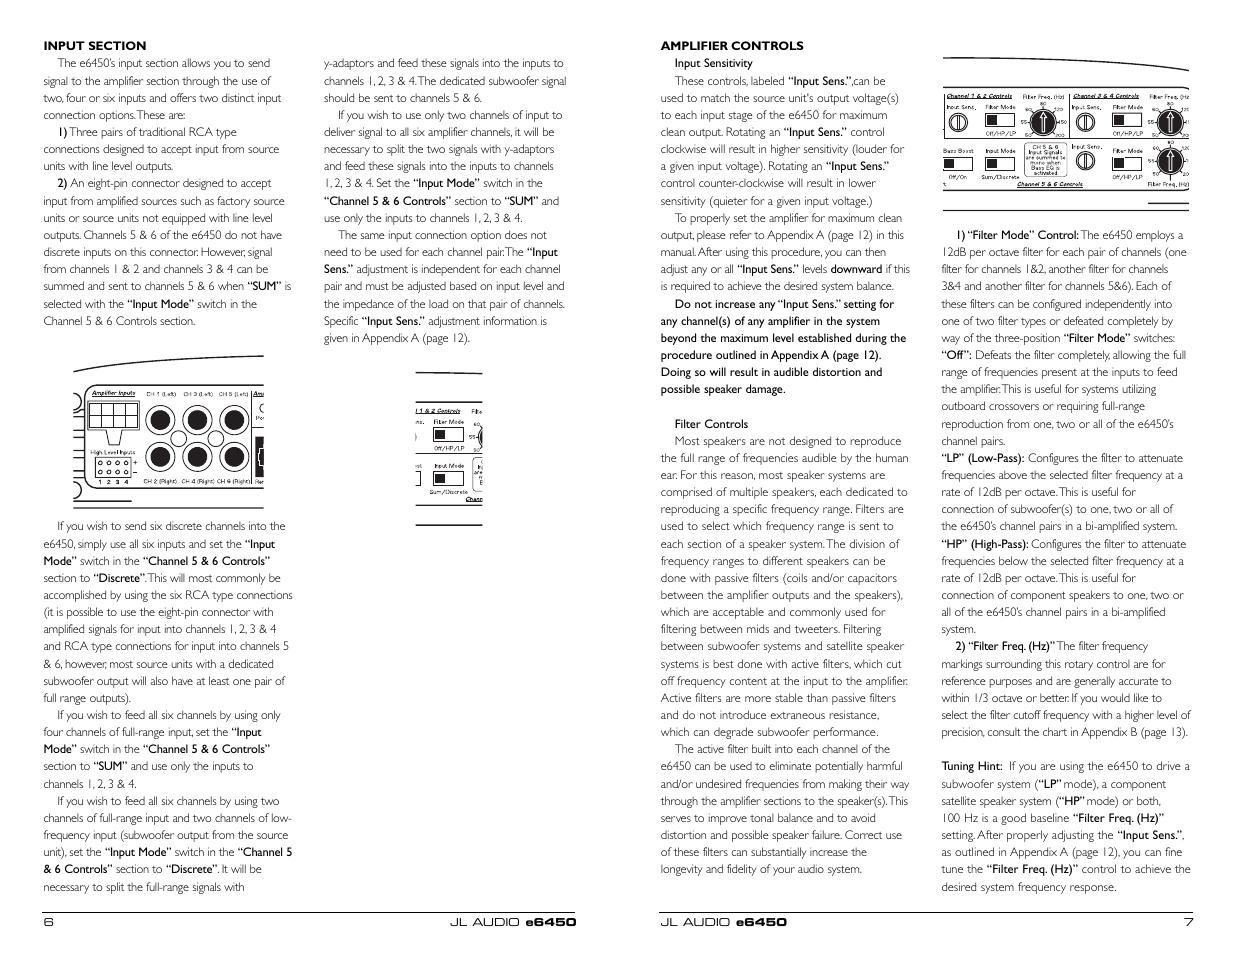 Ebook-7447] jl audio car audio manuals | 2019 ebook library.